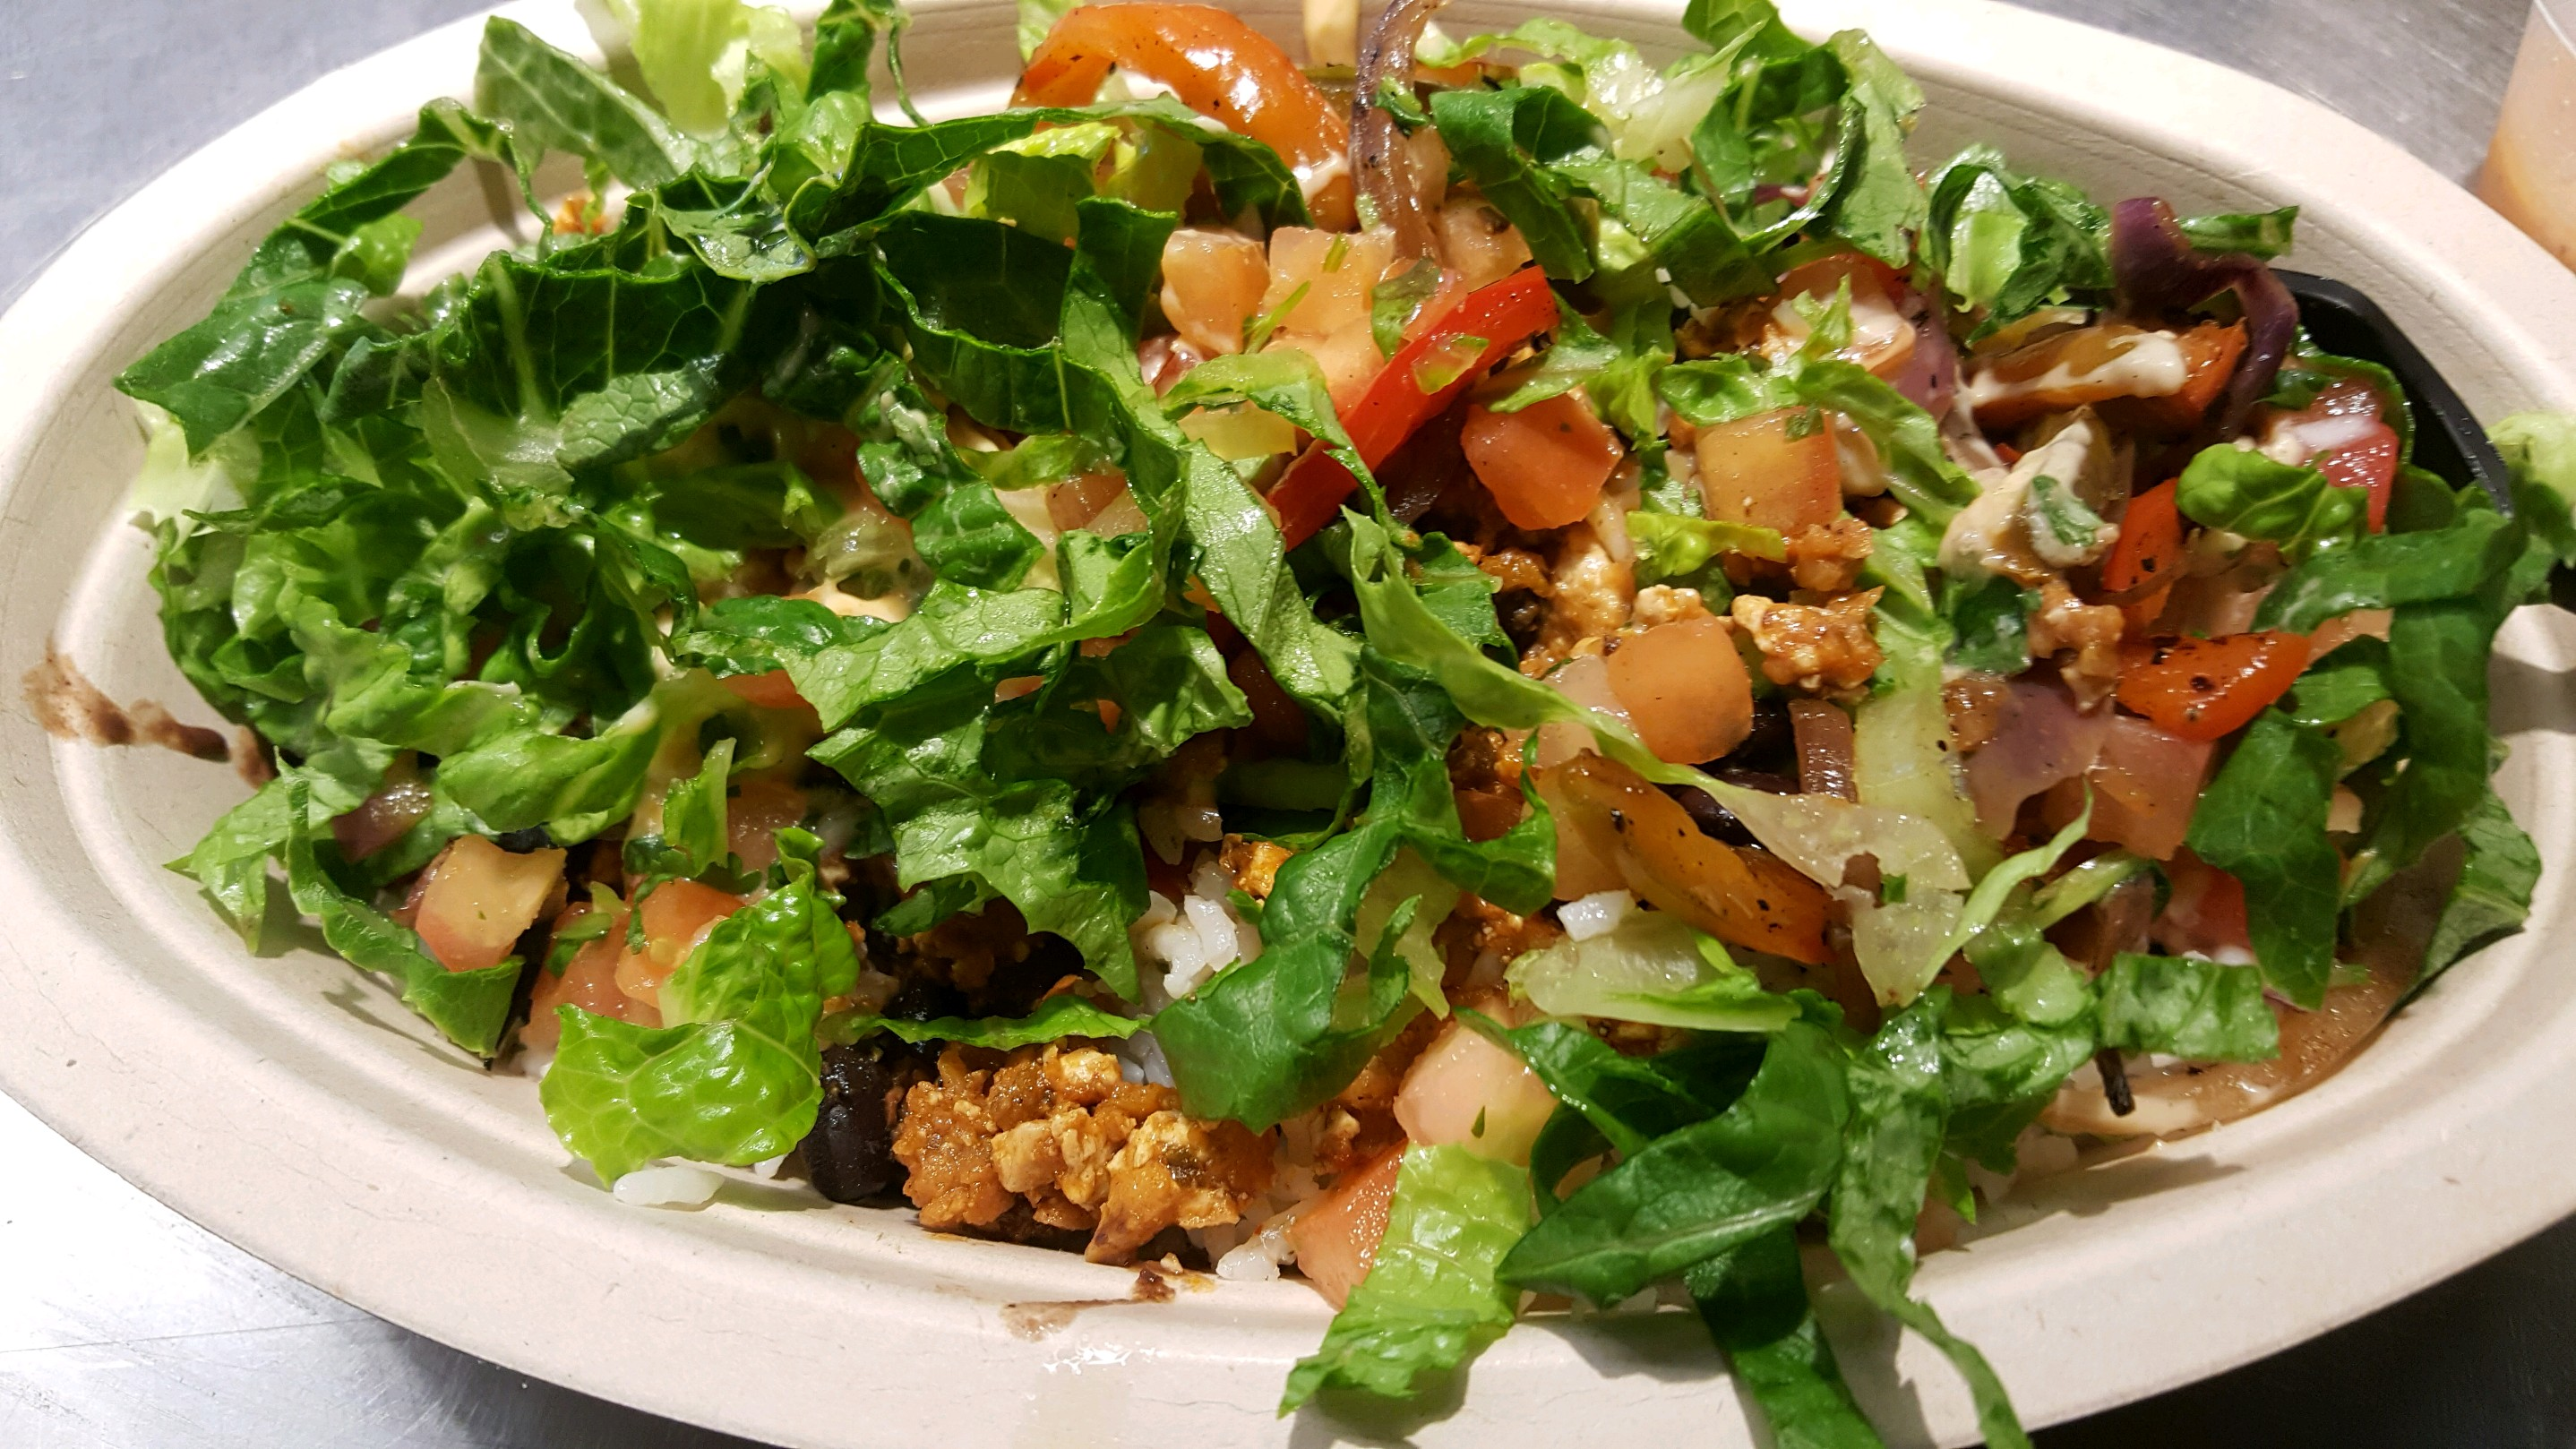 Vegan Options At Chipotle Vegetarian Options At Chipotle